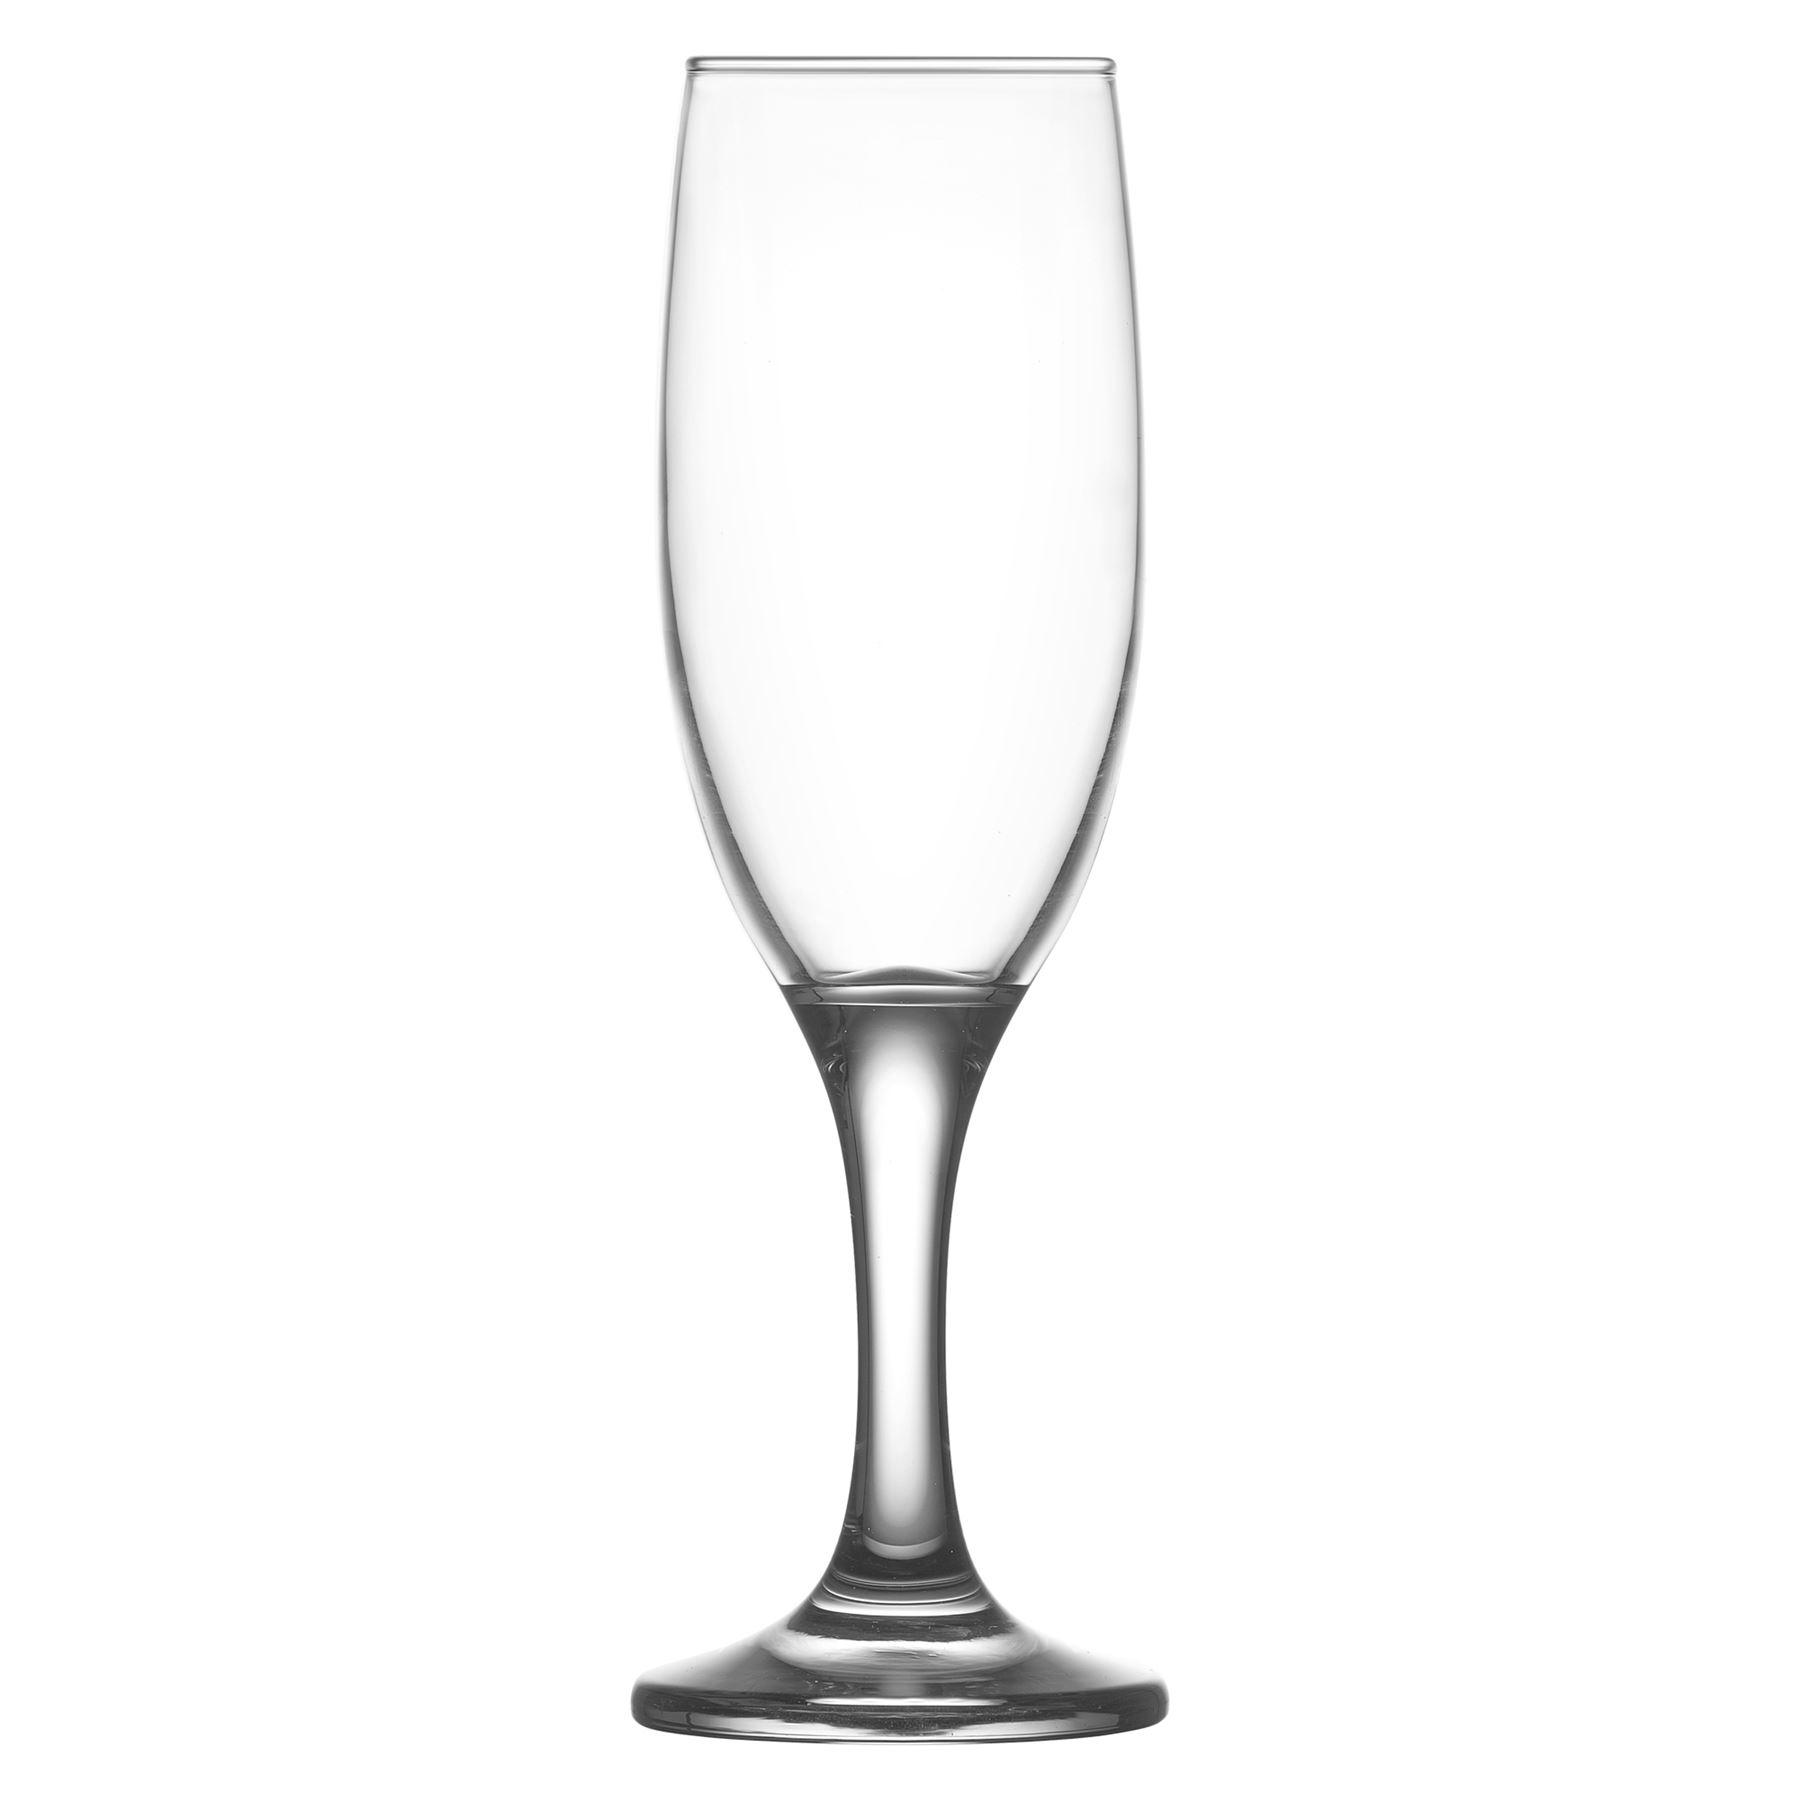 Misket Glass Champagne Flutes